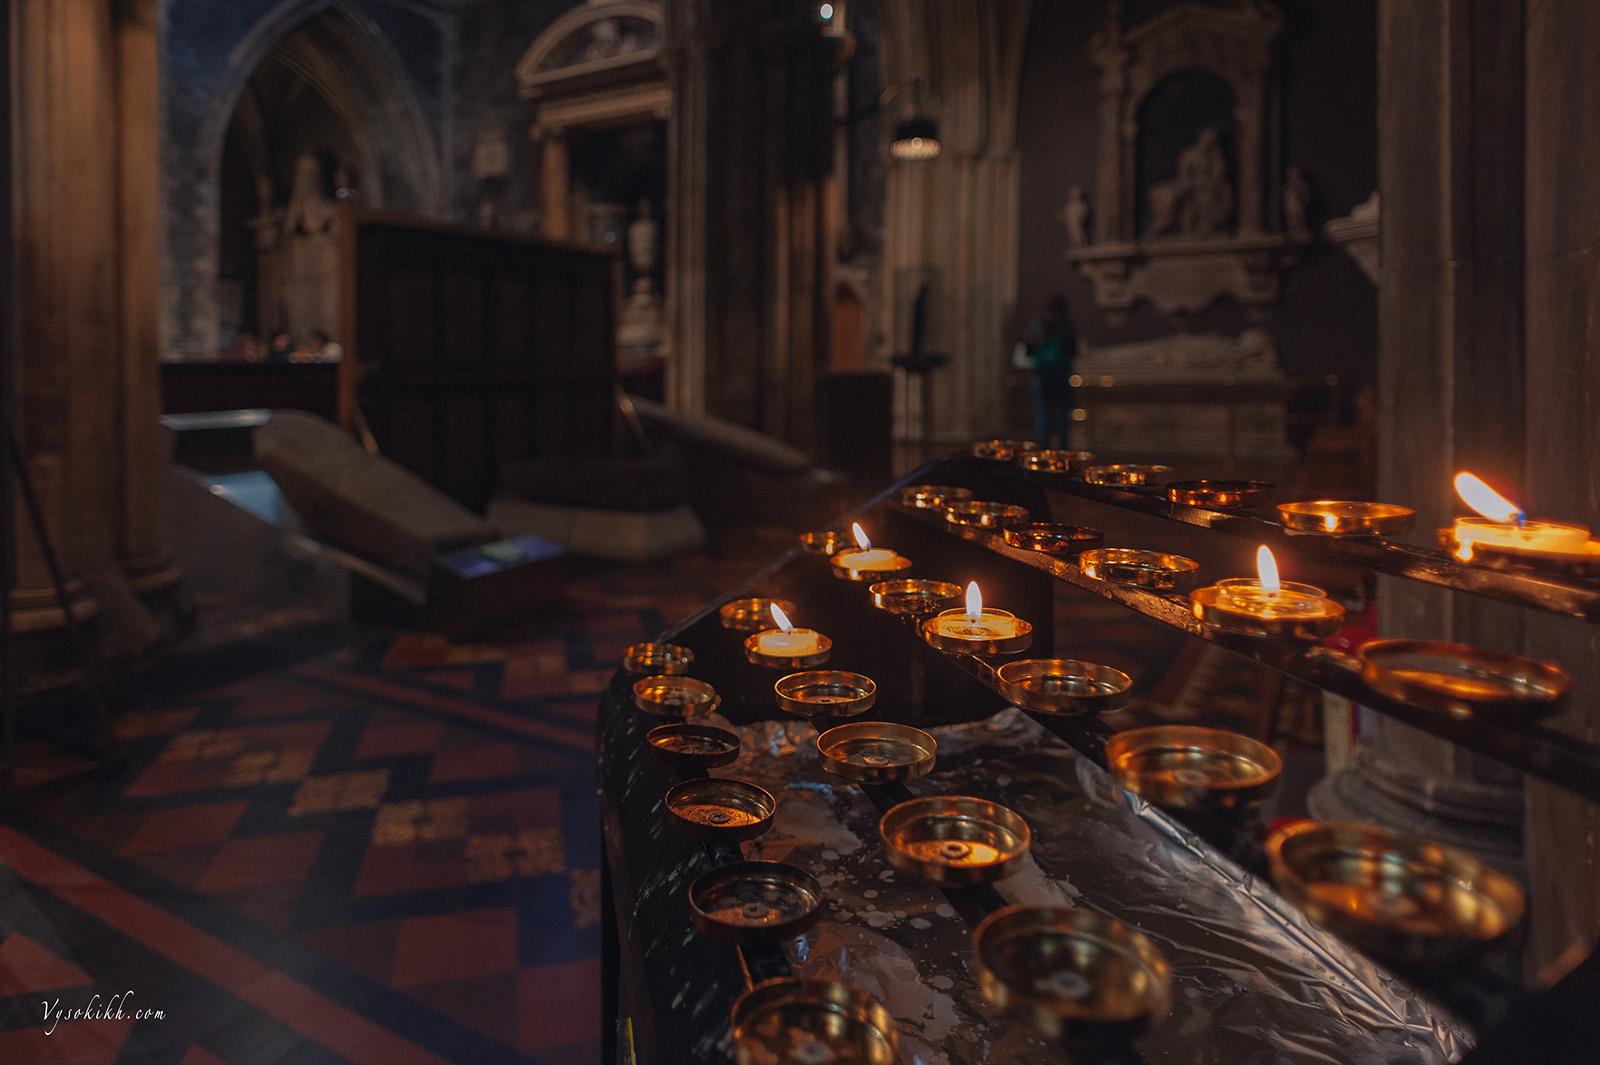 Saint Patrick's Cathedral (Árd Eaglais Naomh Pádraig) Собор Святого Патрика, интерьеры.